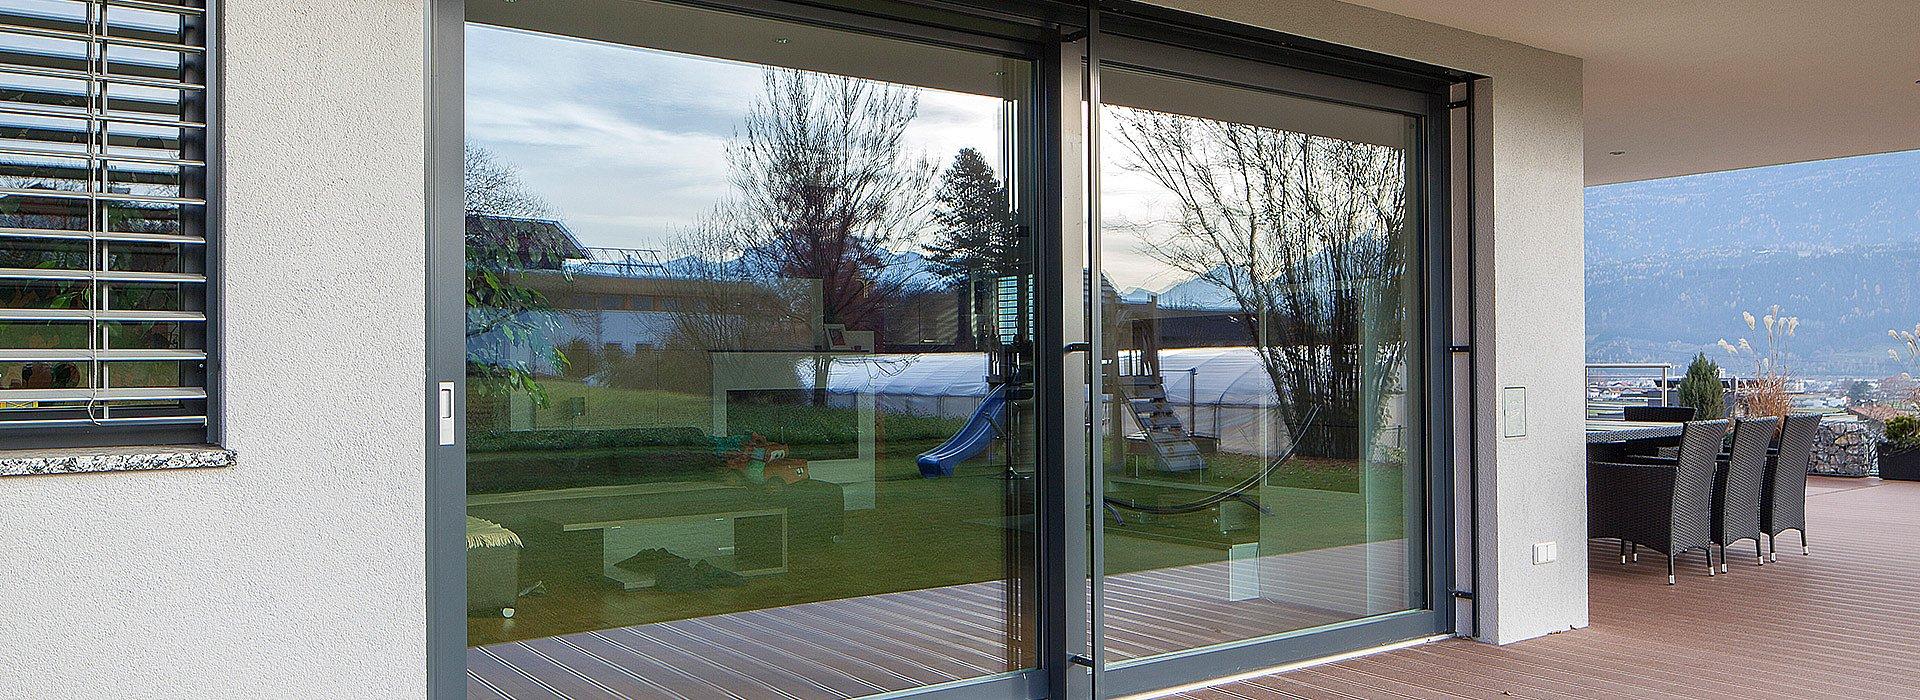 Kunststoff alu posch fenster t ren for Fenster kunststoff